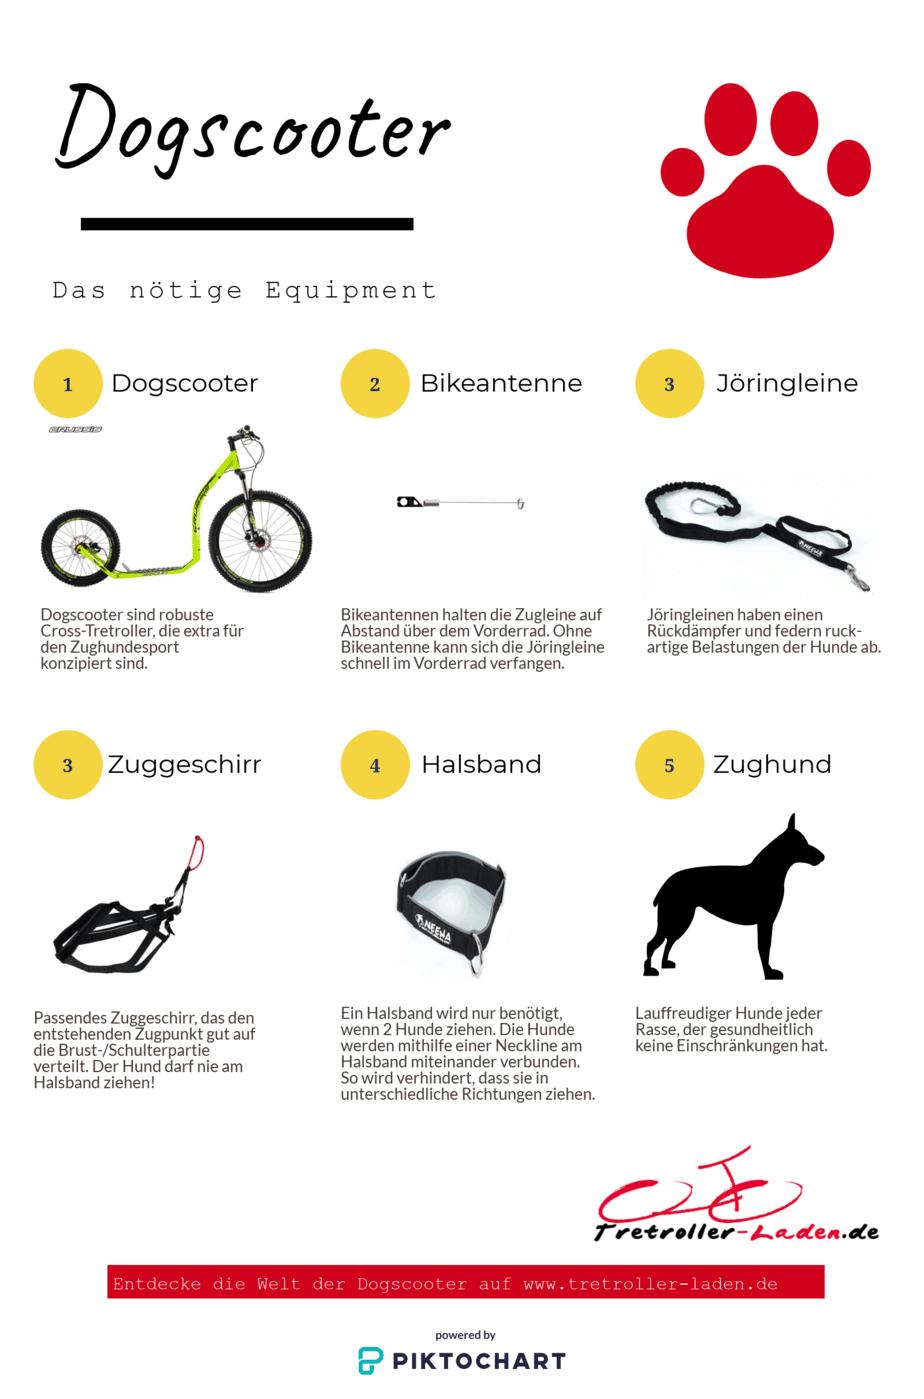 infografik-dogscooter-mushing-zughundesport-ausruestung-equipment-das-sie-benoetigen